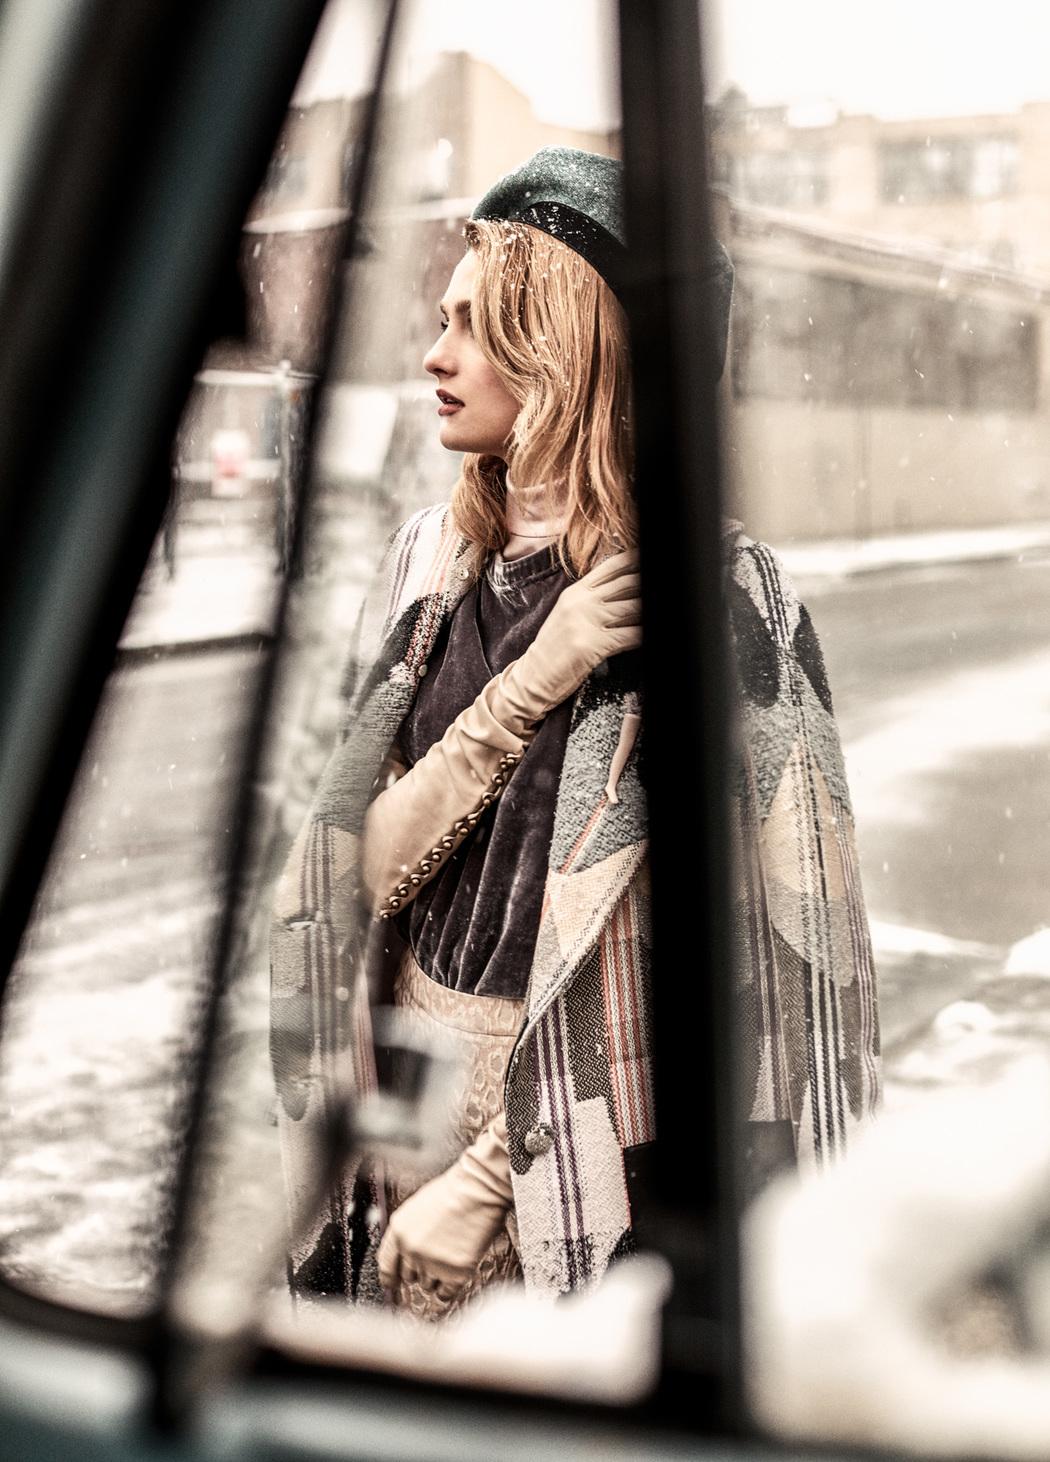 пальто, Georgine; водолазка, Victoria Hayes; топ, Calvin Klein; брюки, Just Cavalli; лоферы на каблуках, Gucci; берет, Donna Karan;  перчатки, LaCrasia; брошь, винтаж